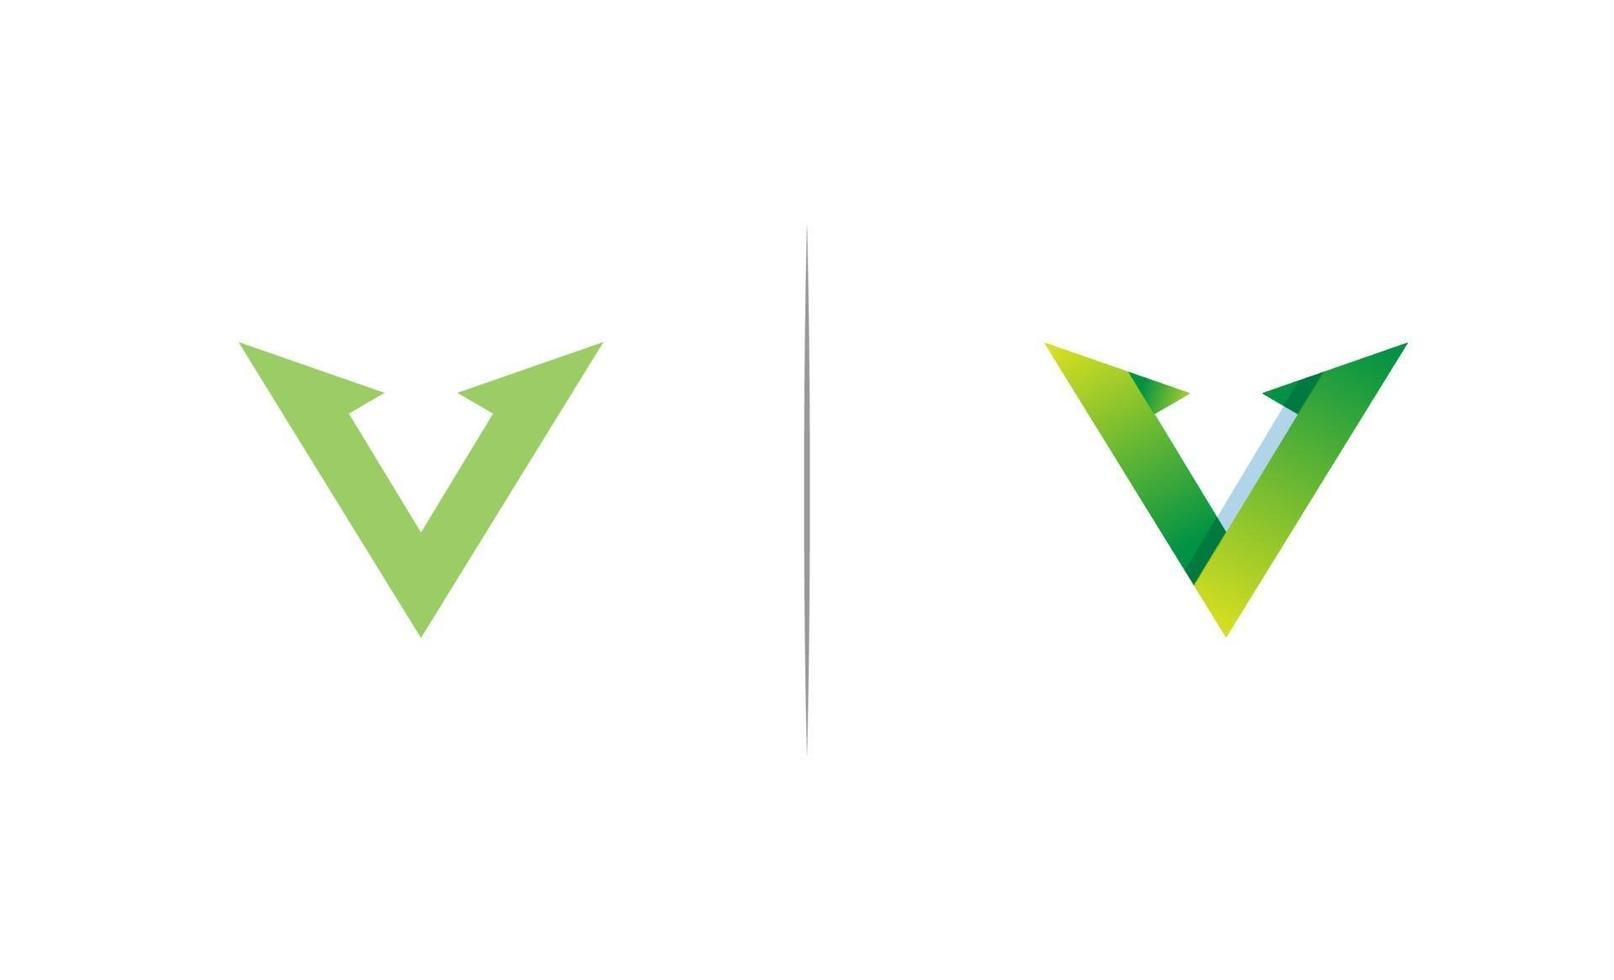 anfänglicher V-Logo-Entwurfsschablonenvektor vektor